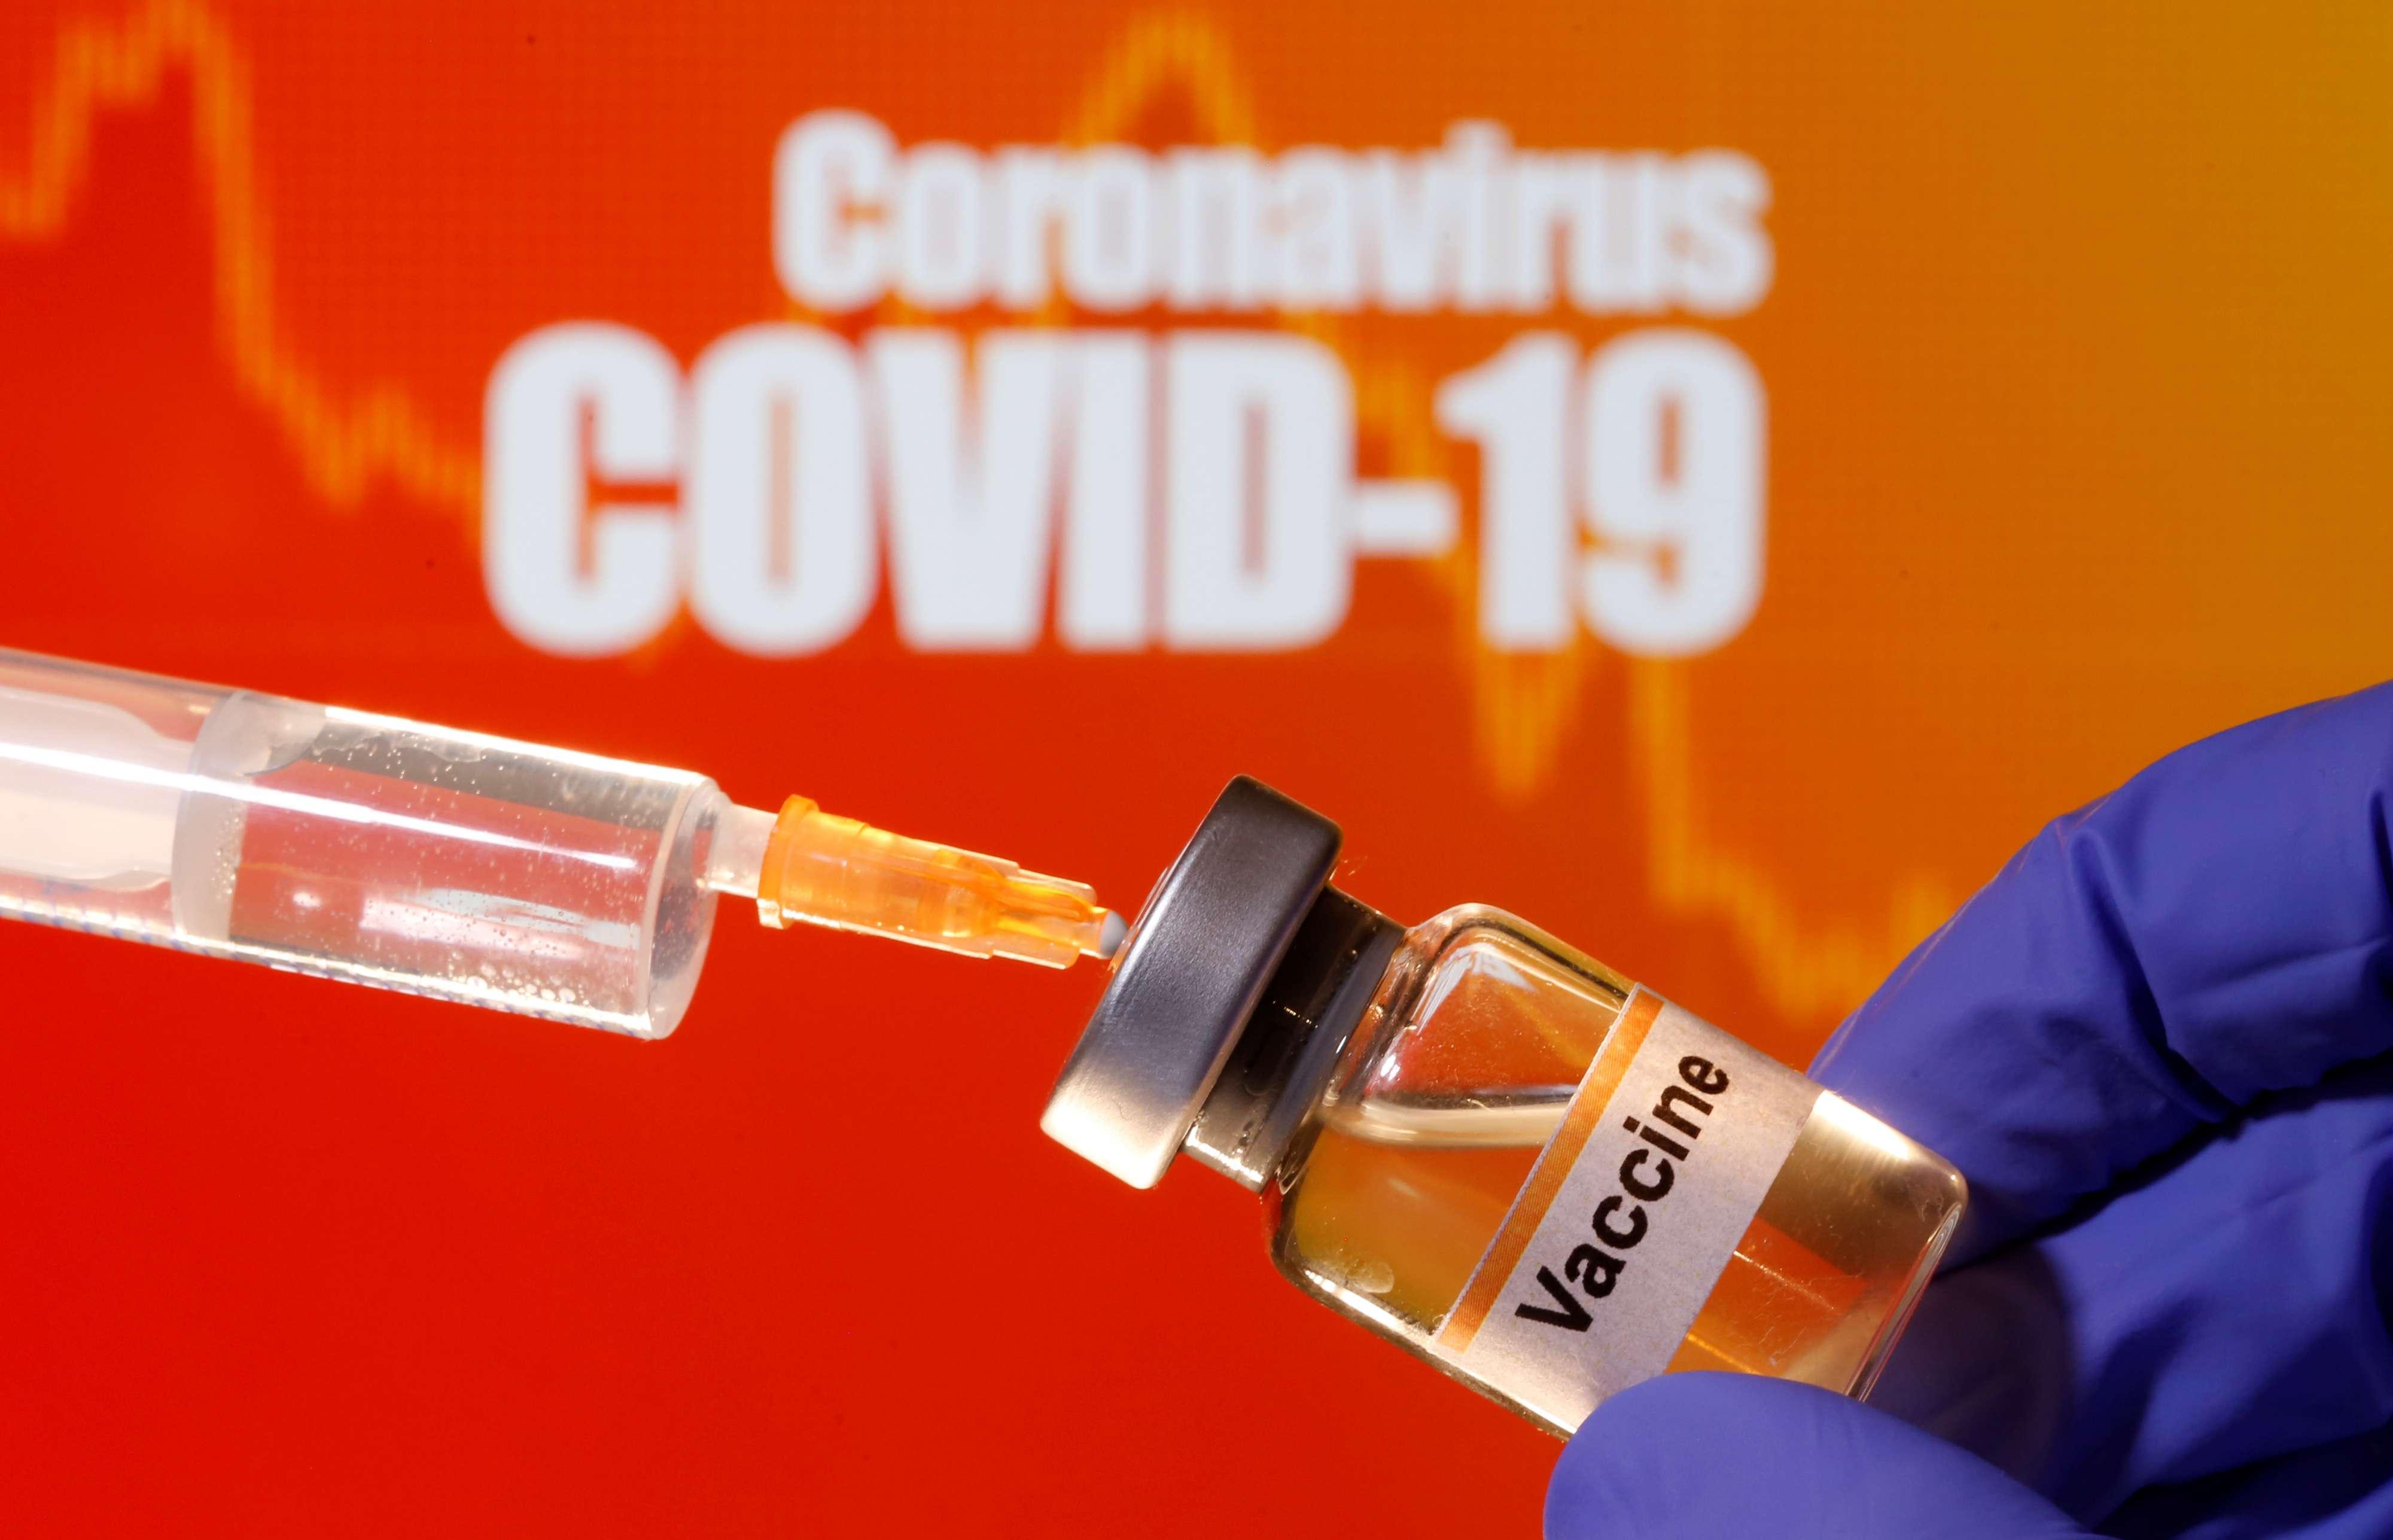 20200410101410reup--2020-04-10t101249z_1971402885_rc2m1g9sgga1_rtrmadp_3_health-coronavirus-vaccine.h